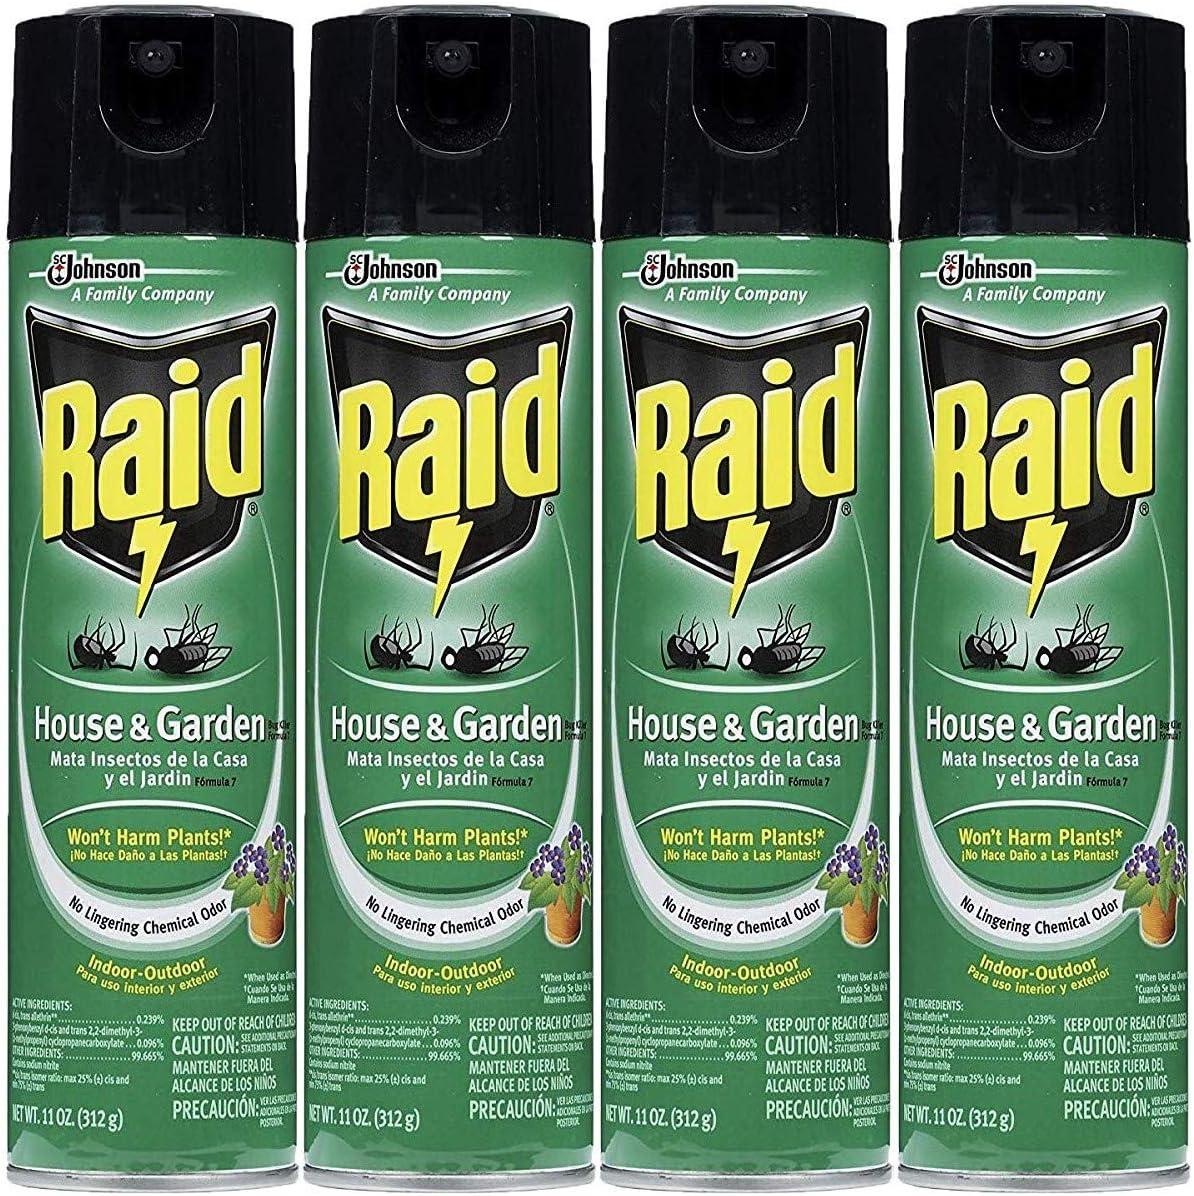 Raid House and Garden Aerosol, 11 OZ (Pack - 4)